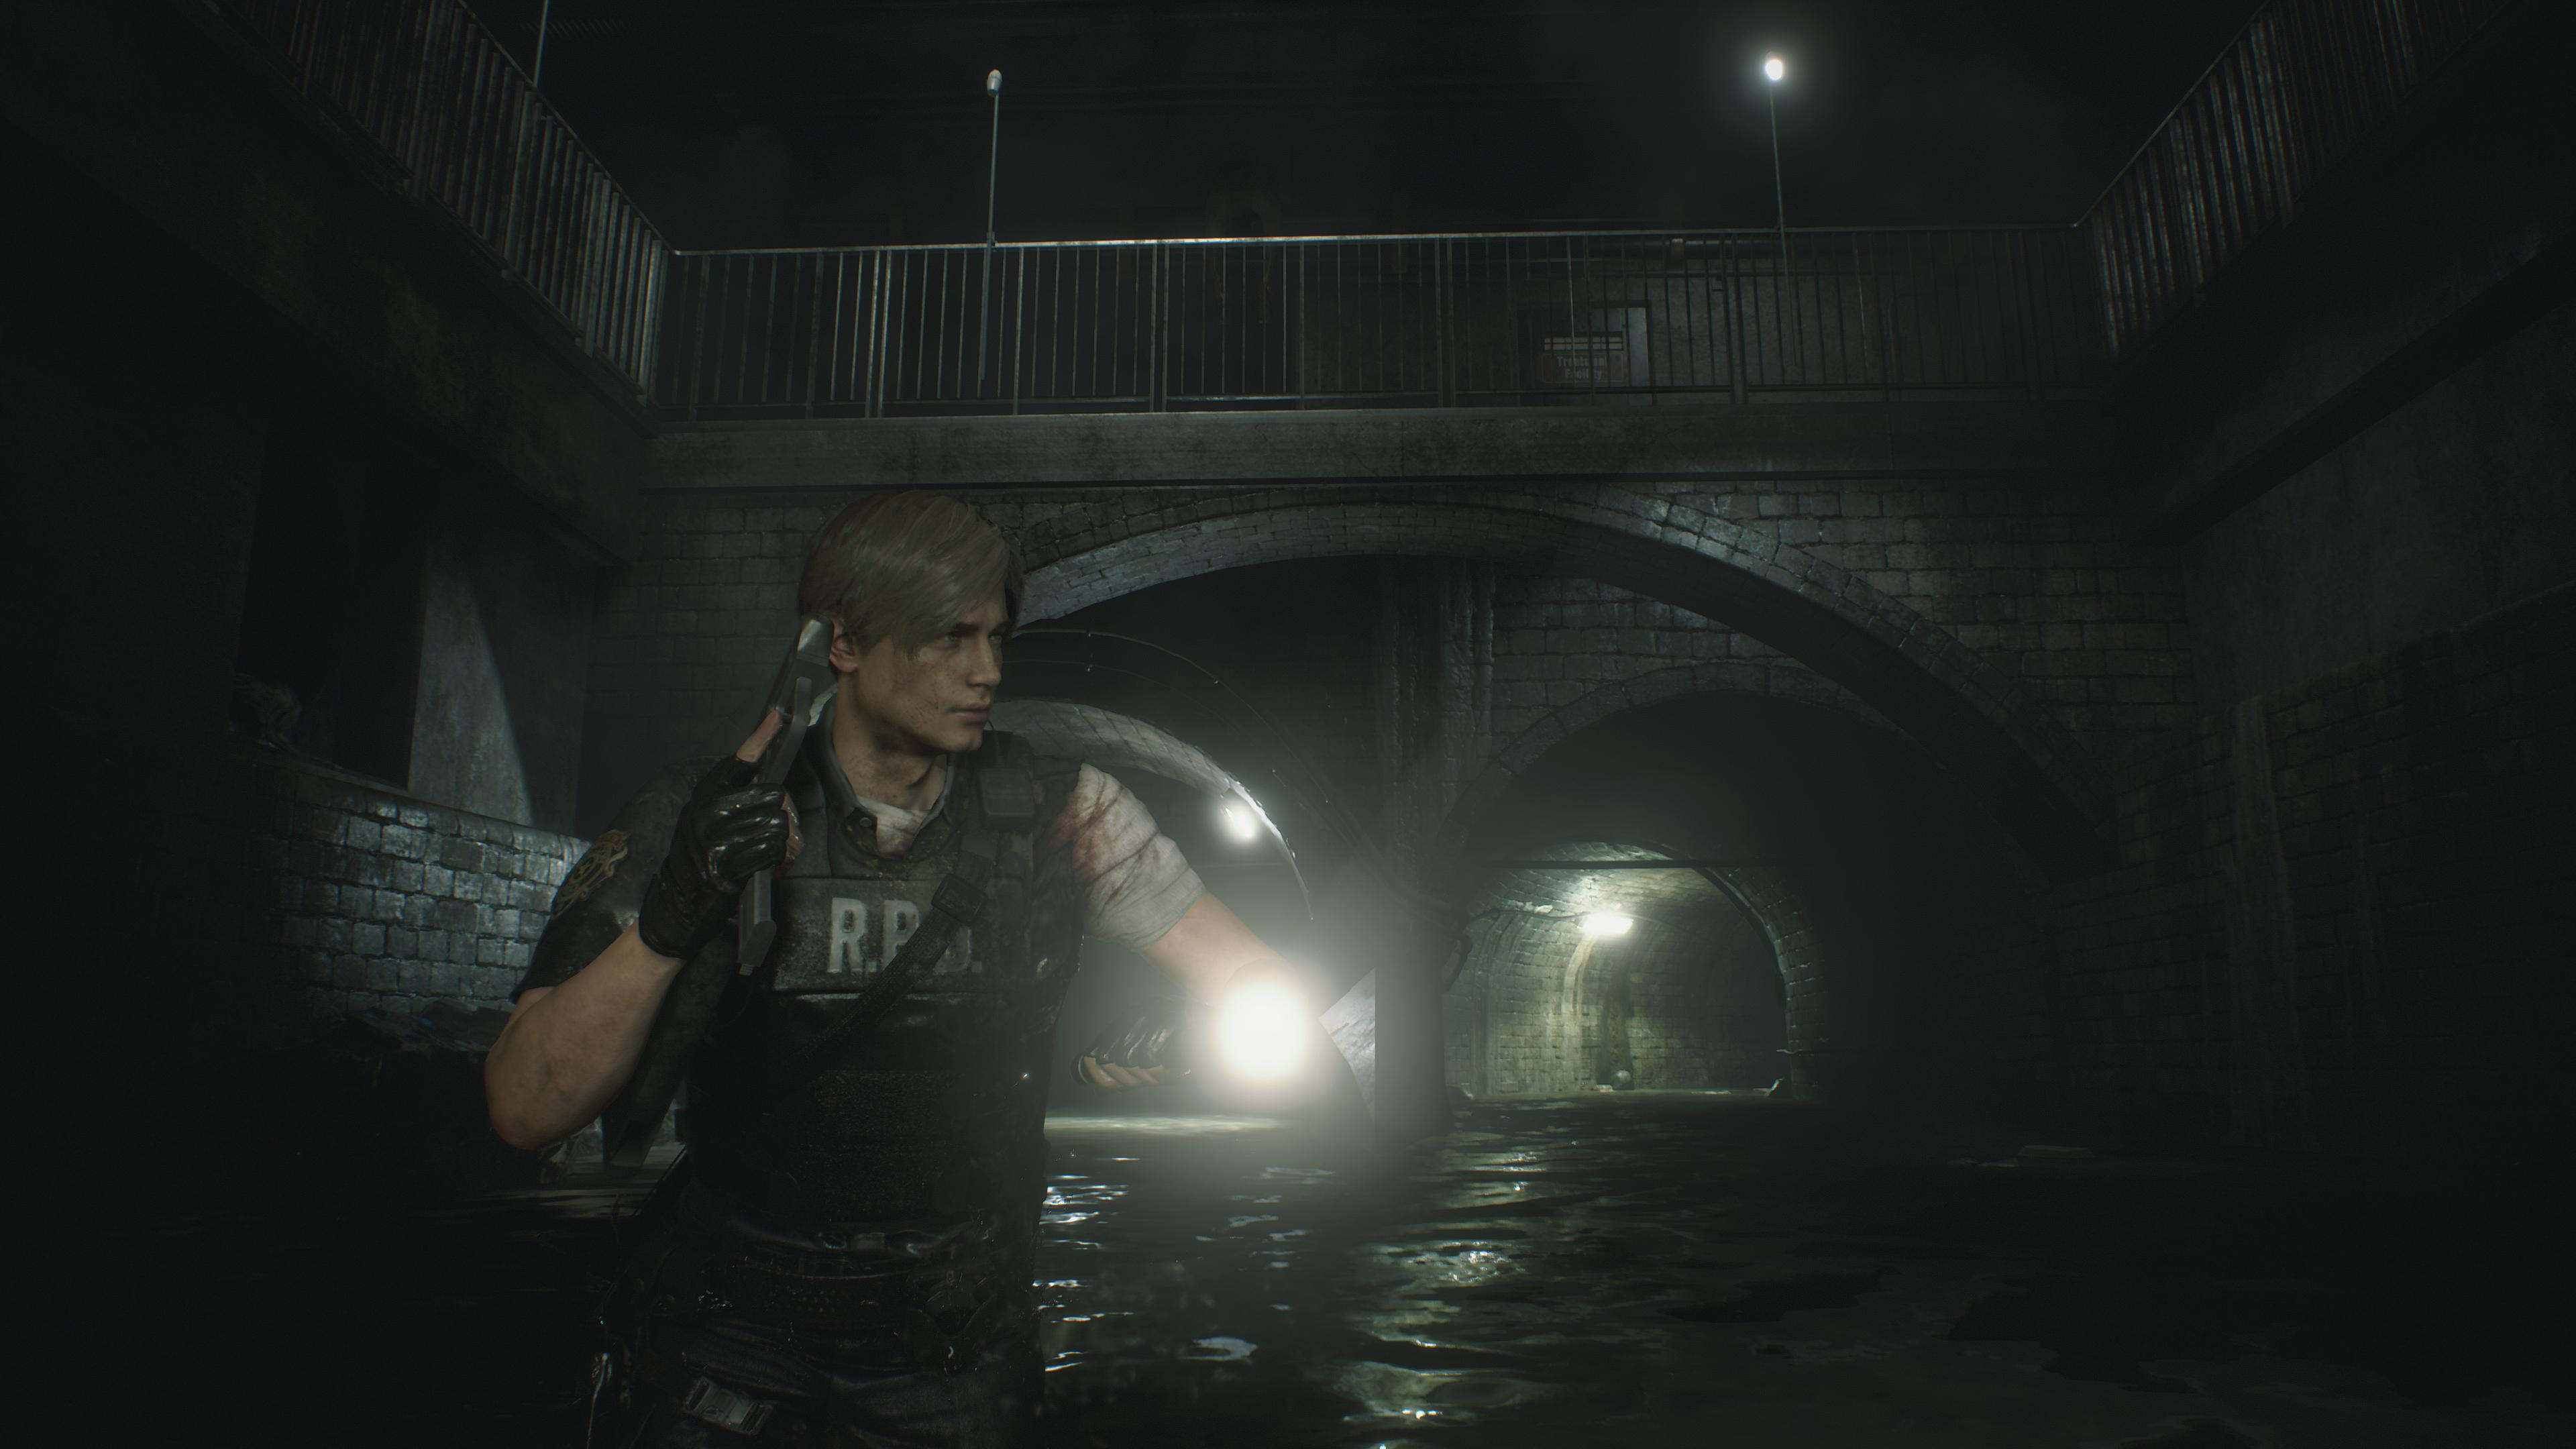 Resident Evil 2 2019 Leon S Kennedy 4k Ultra Hd Wallpaper